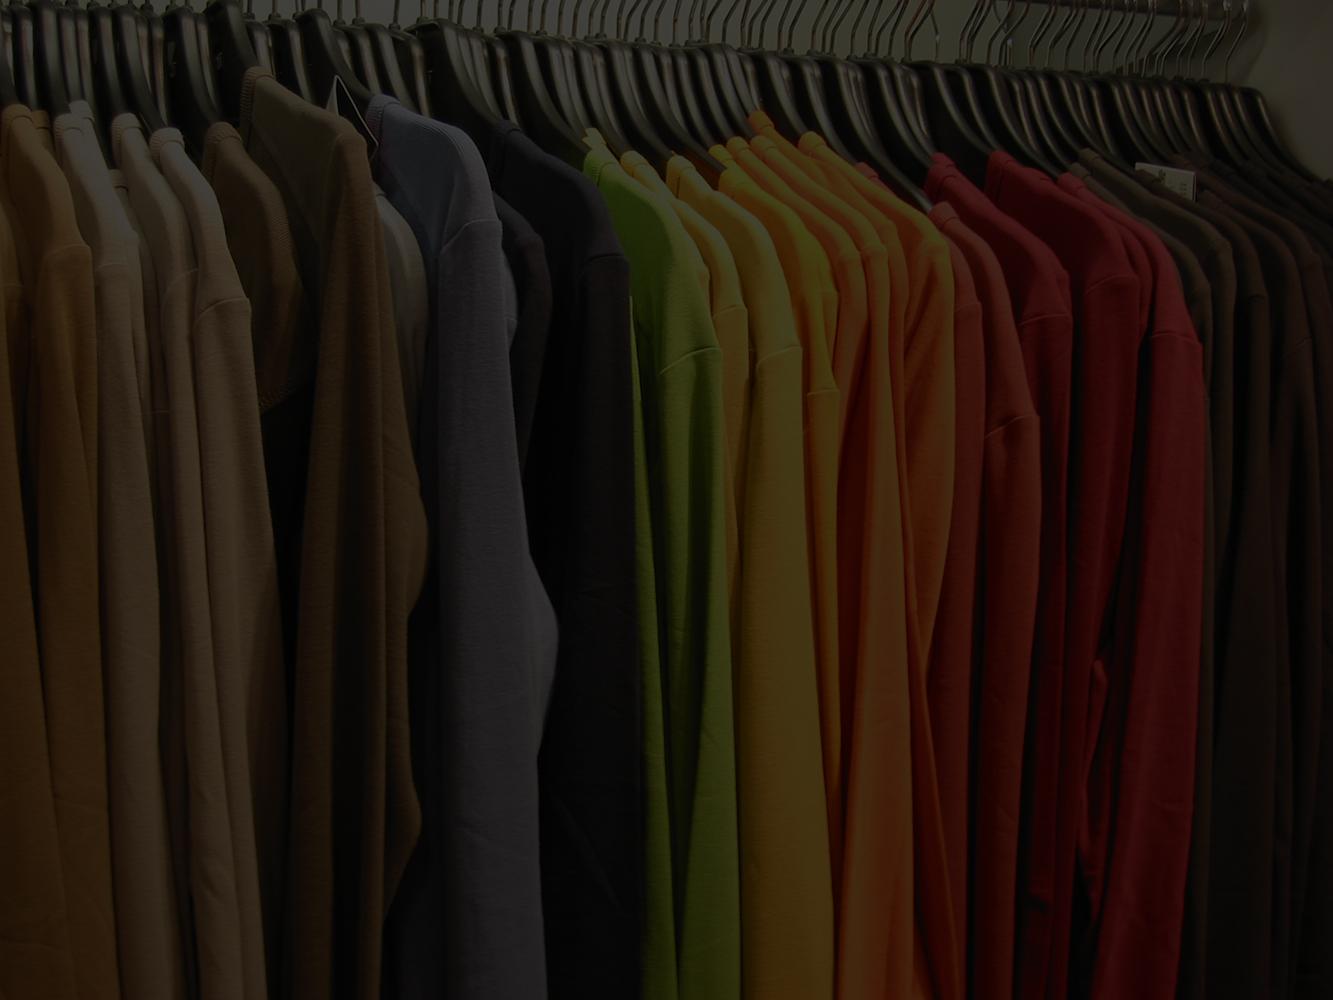 clothesedit